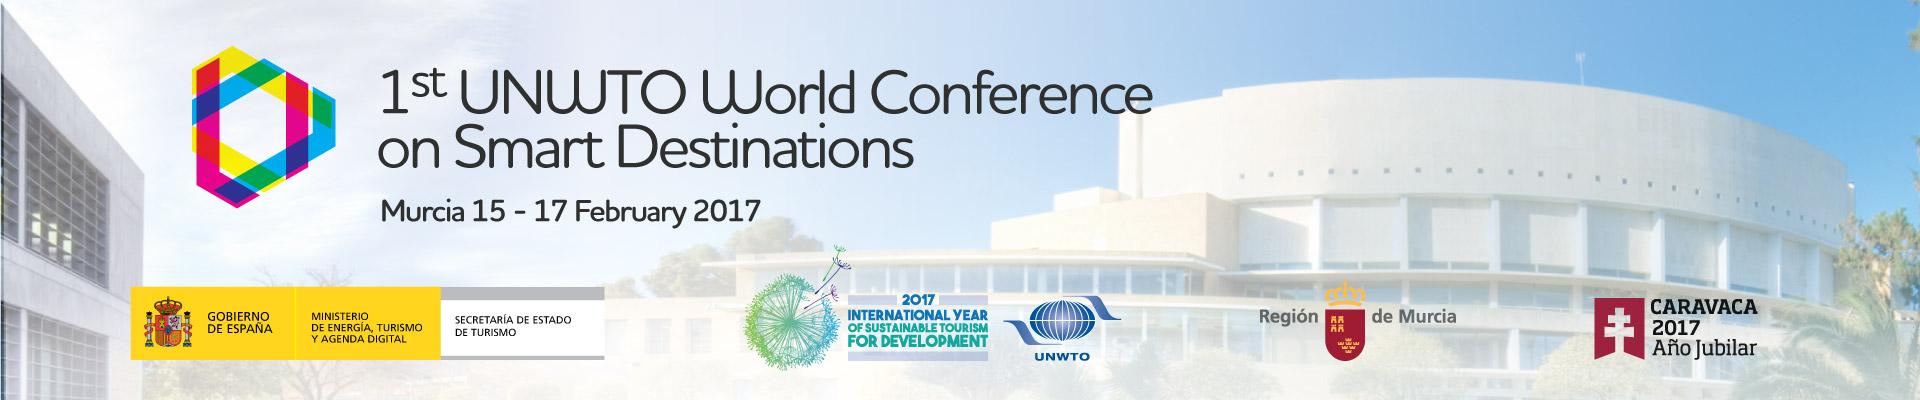 I Congreso Mundial de la OMT sobre Destinos Inteligentes